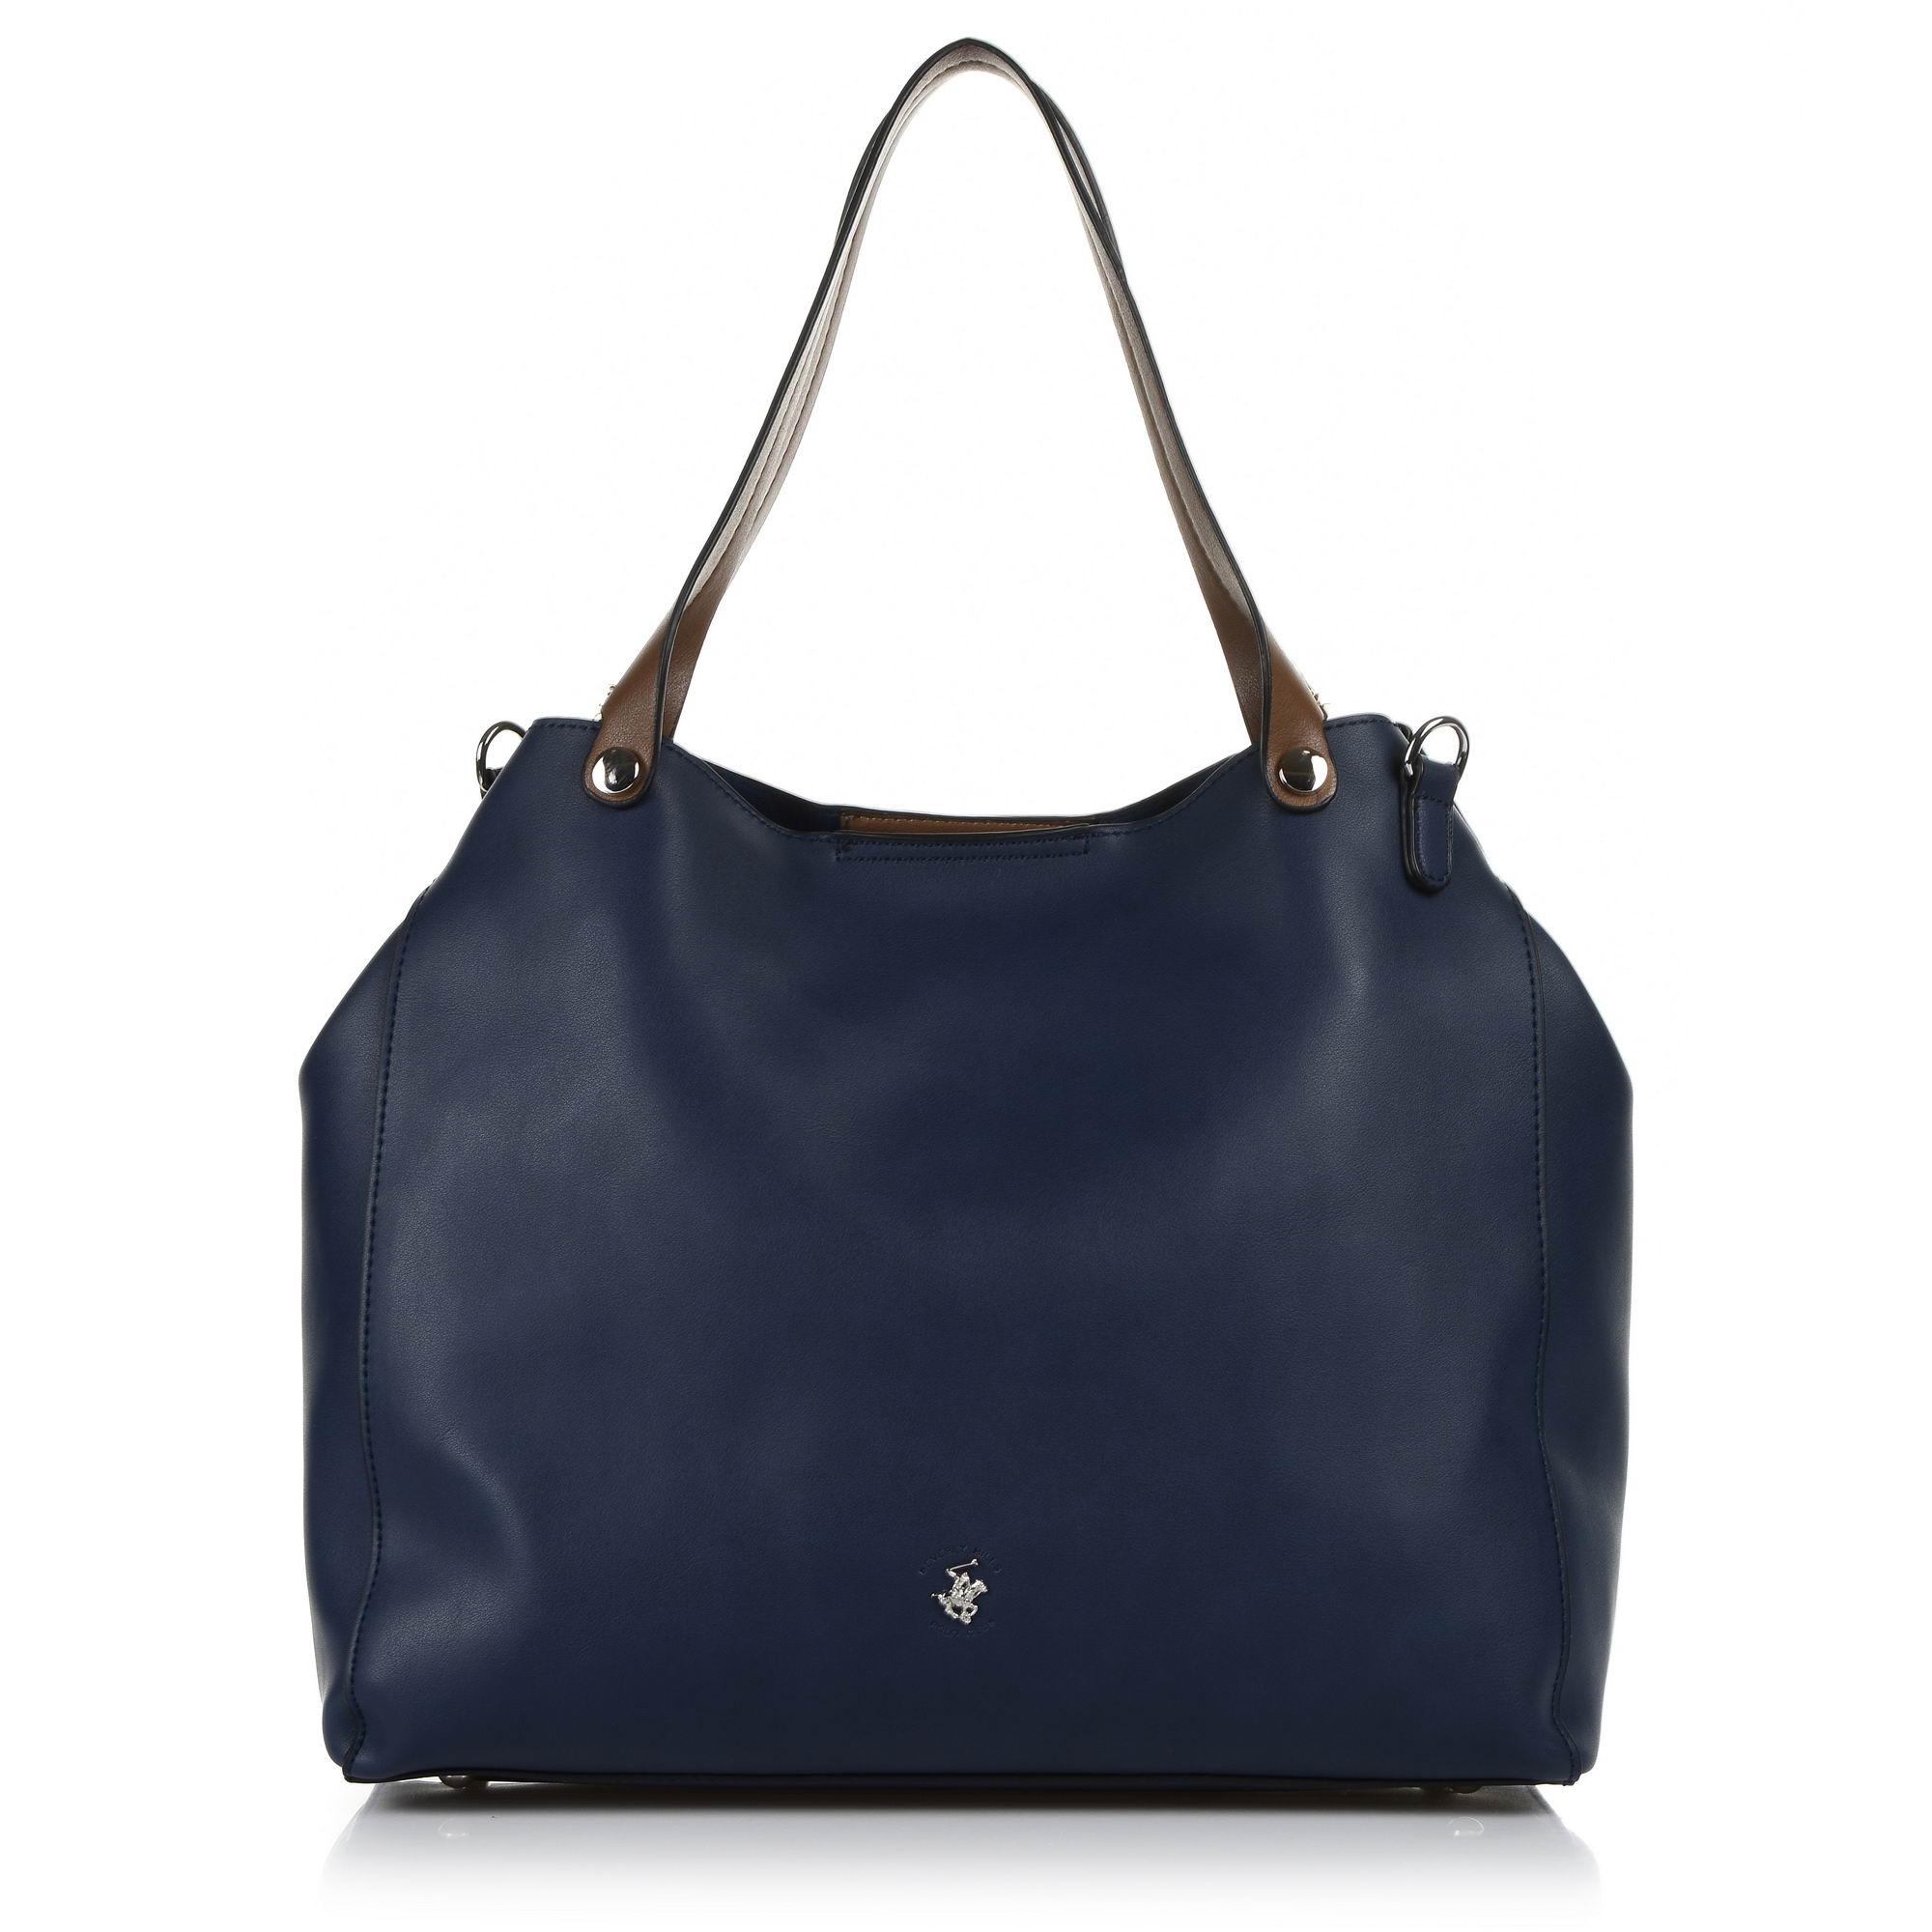 0ac169d42d3 Τσάντα Ώμου-Χιαστί Beverly Hills Polo Club BH-1412